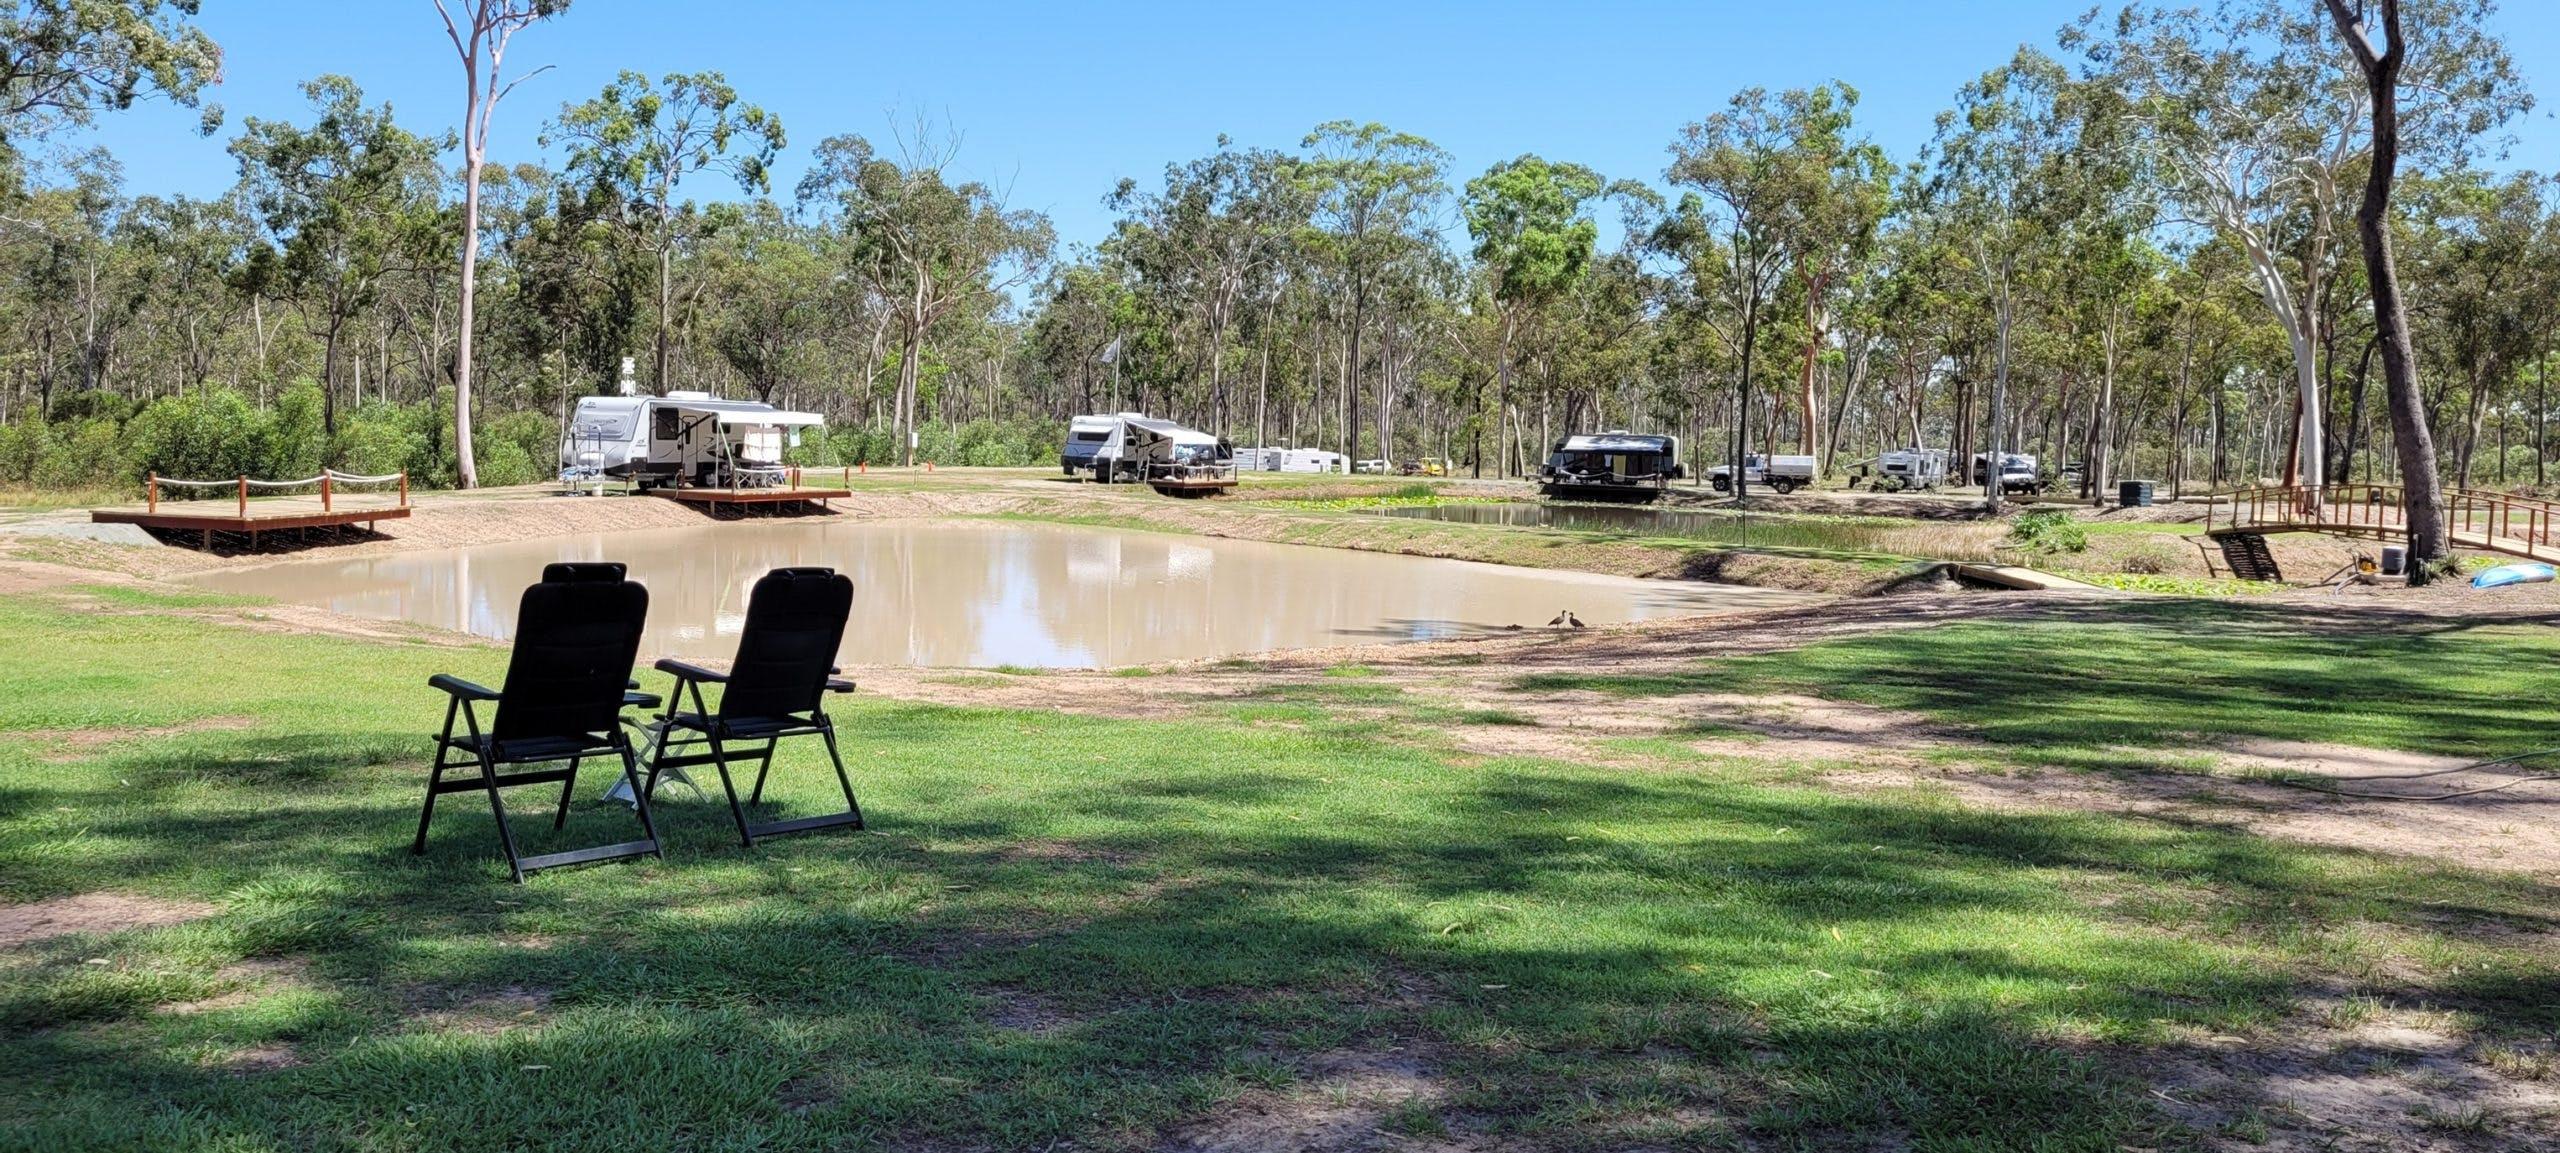 Gum Tree Lodge & Bush Camp Over 50's